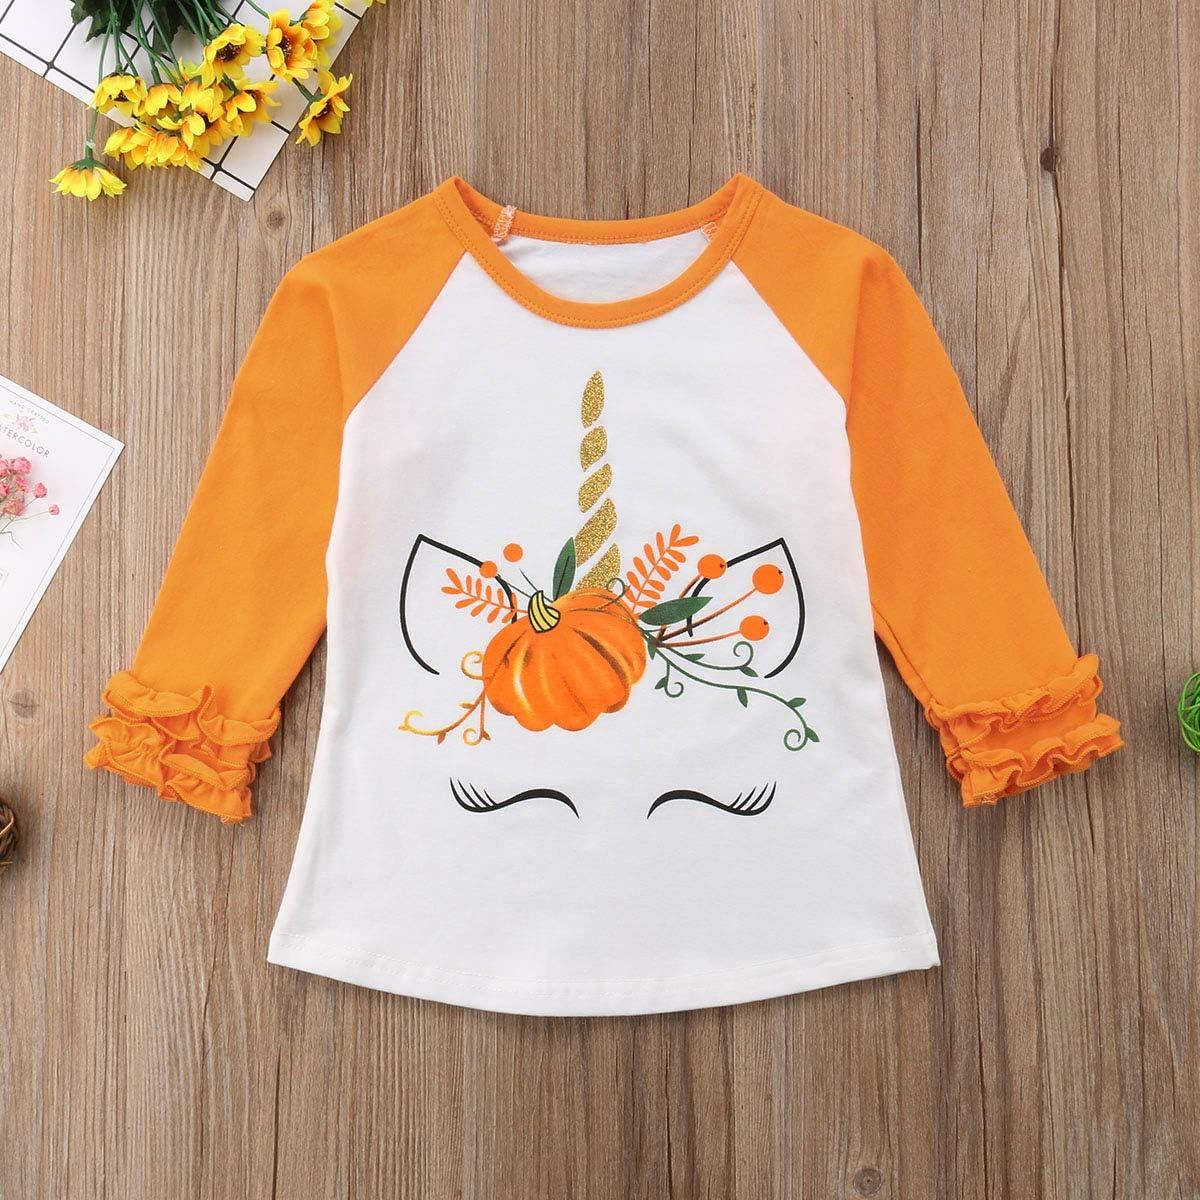 Toddler Baby Girls Halloween Long Sleeve Unicorn Pumpkin Printed Ruffles T-Shirt Blouse Tops Clothes Outfits